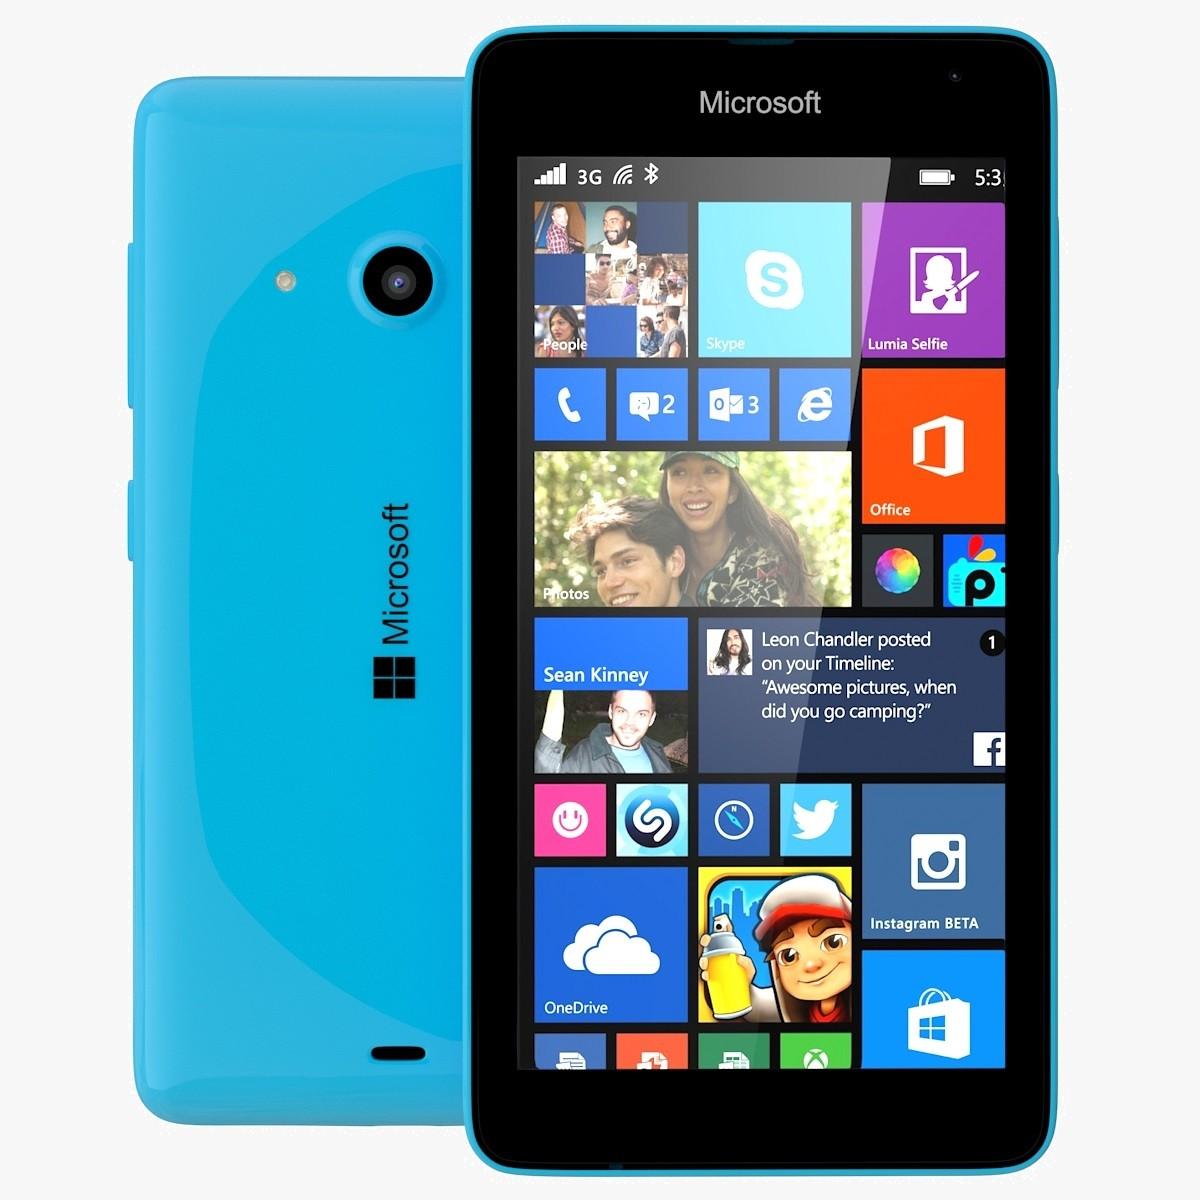 Unlocked Microsoft Lumia 535 8GB Window Smartphone - Cyan Blue (RM-1092) -  Check Back Soon - BLINQ